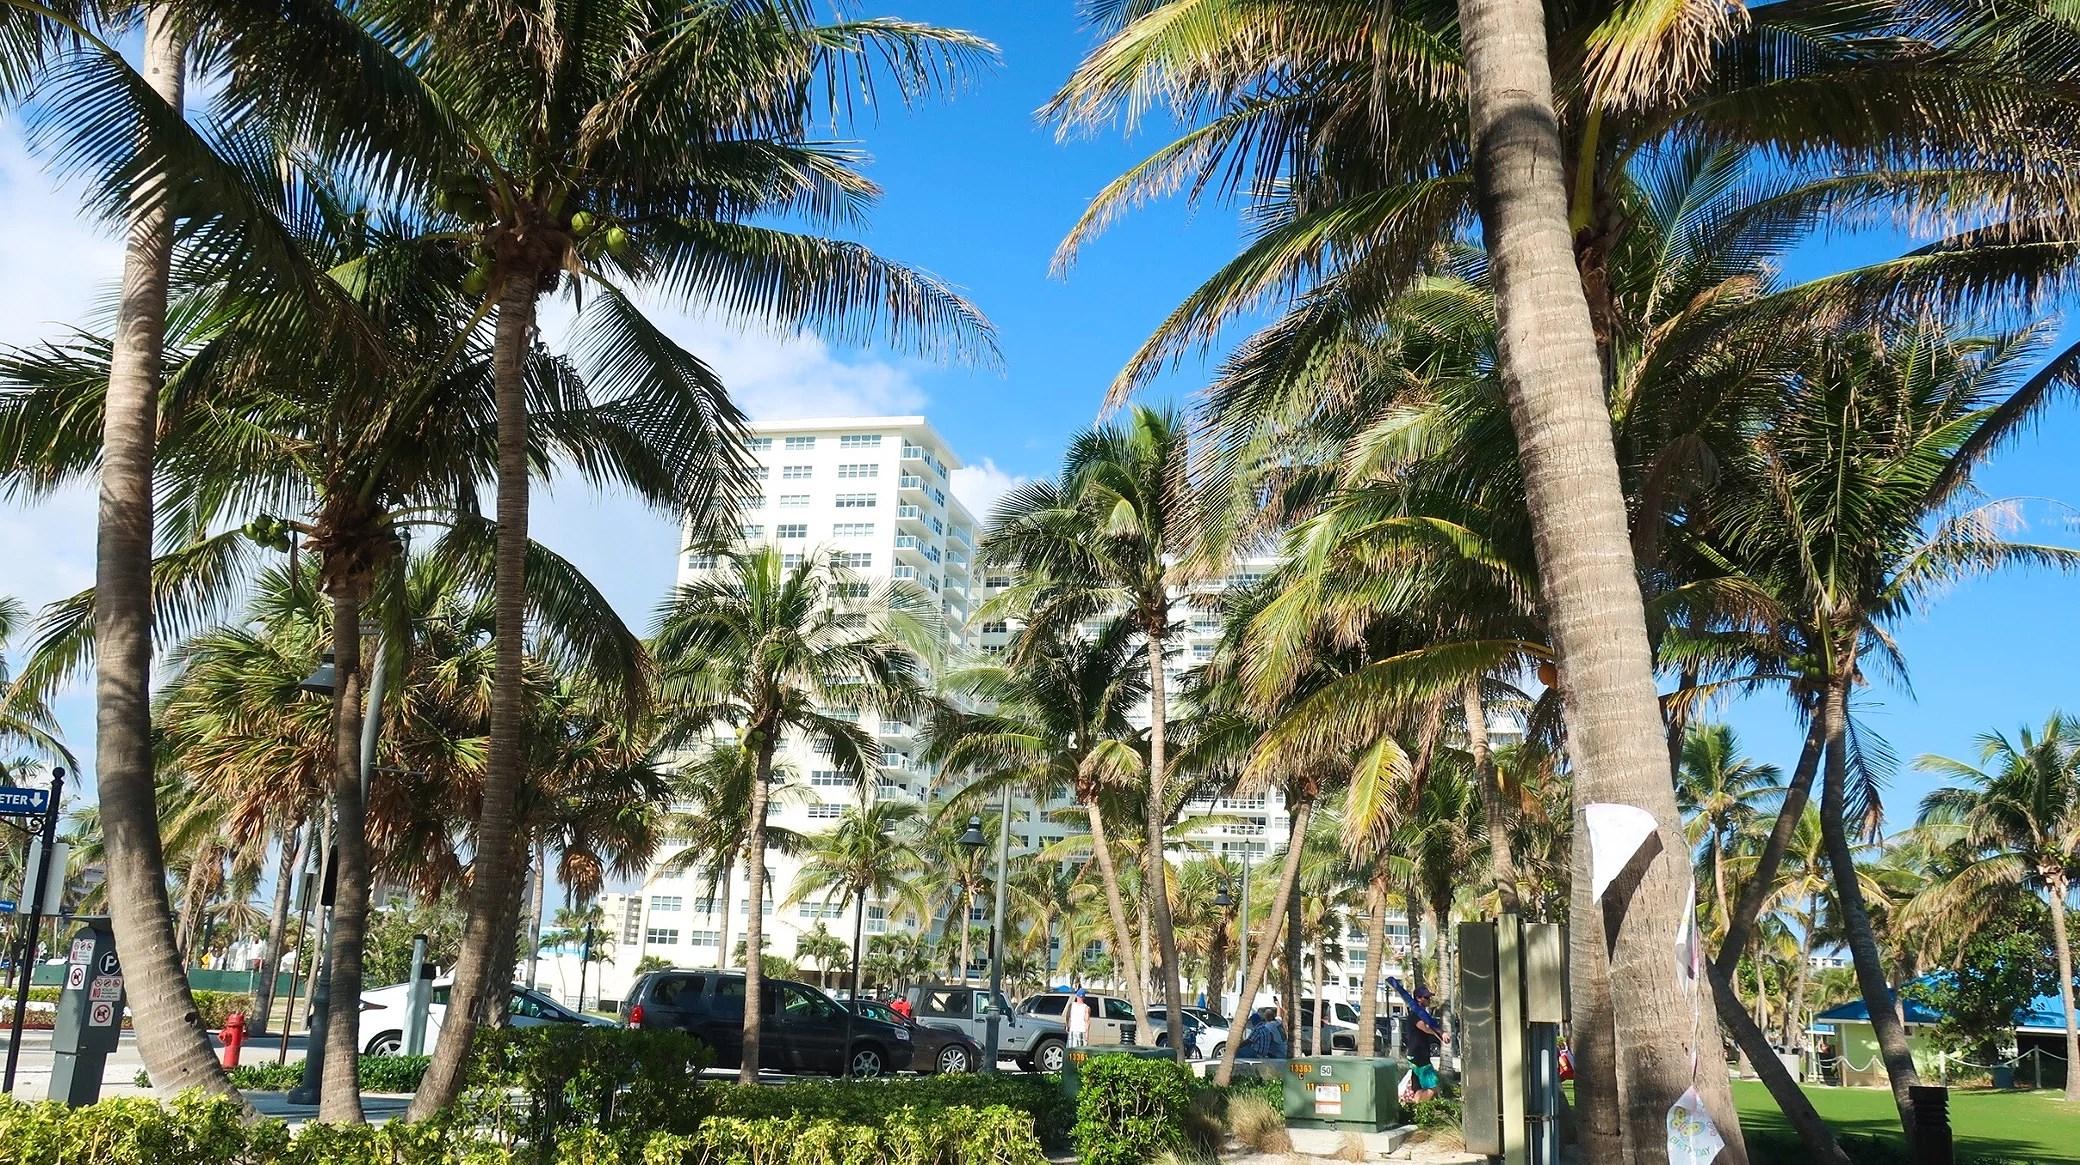 TOUCHDOWN FLORIDA